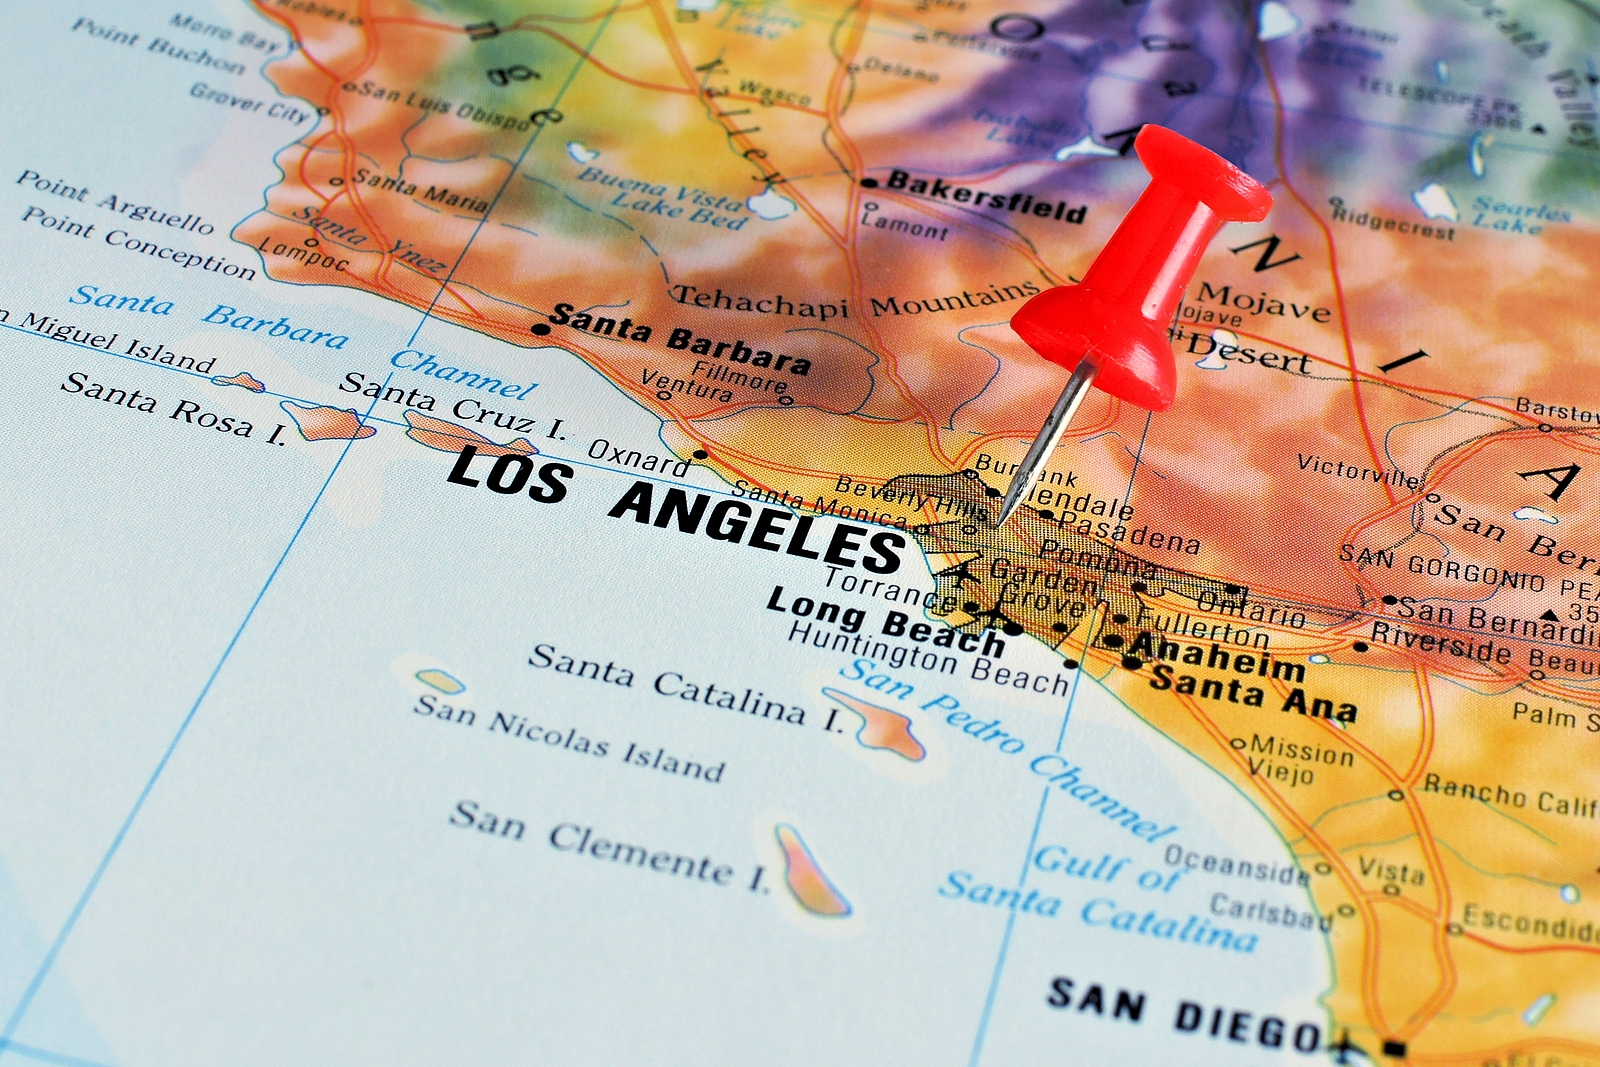 Art Shuttle West Coast – East Coast Scheduled for August 14